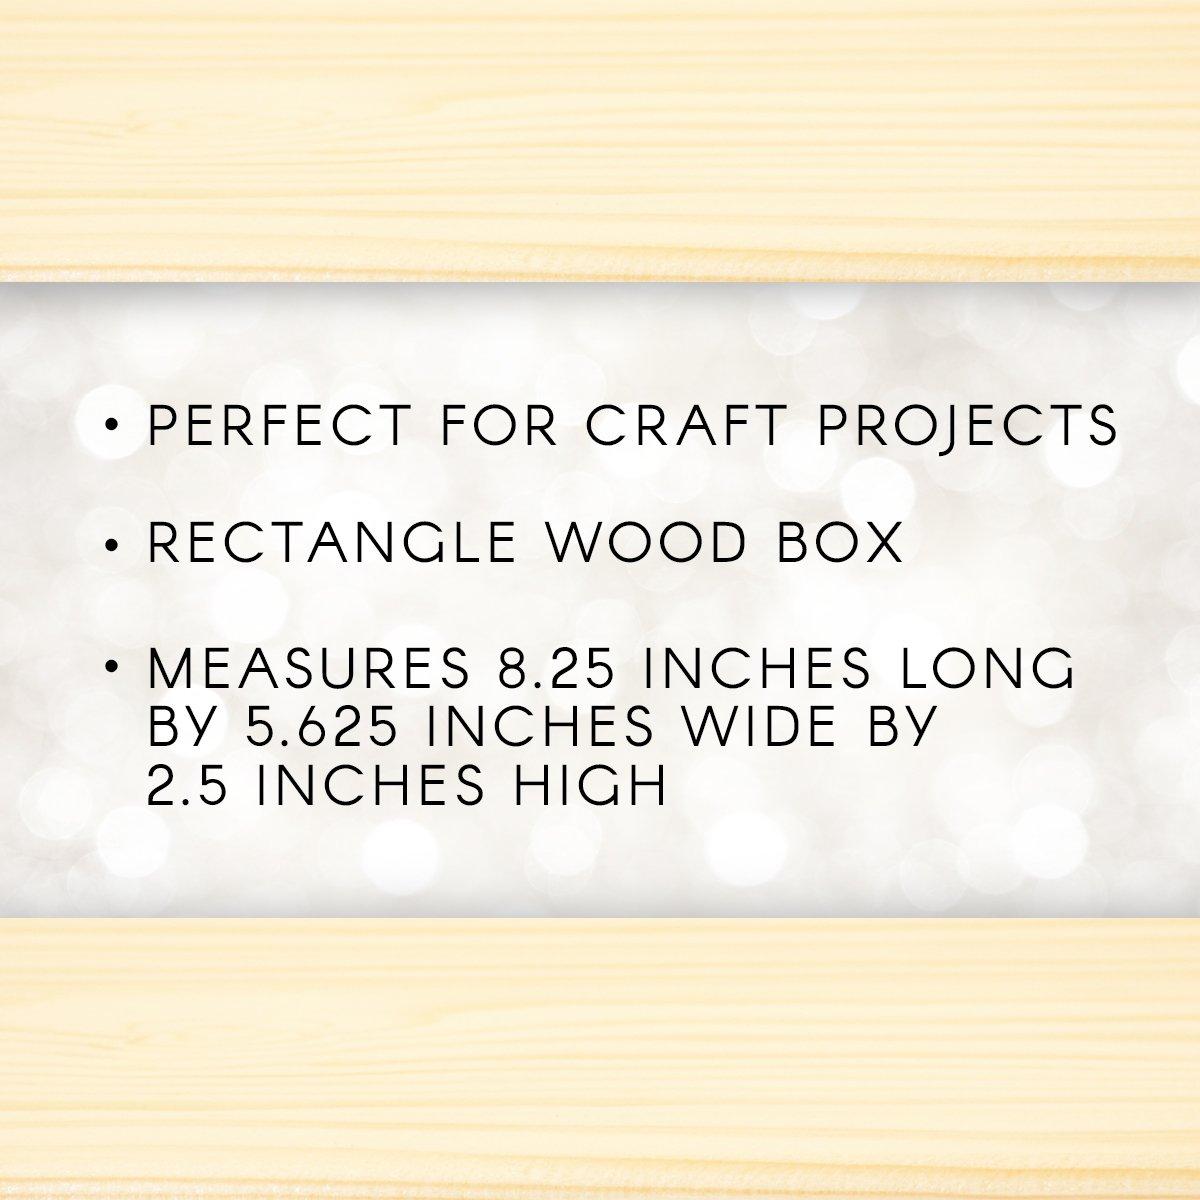 Darice 9151-57 Craft Supplies Multicolor 7.125 x 5.5 x 2.5